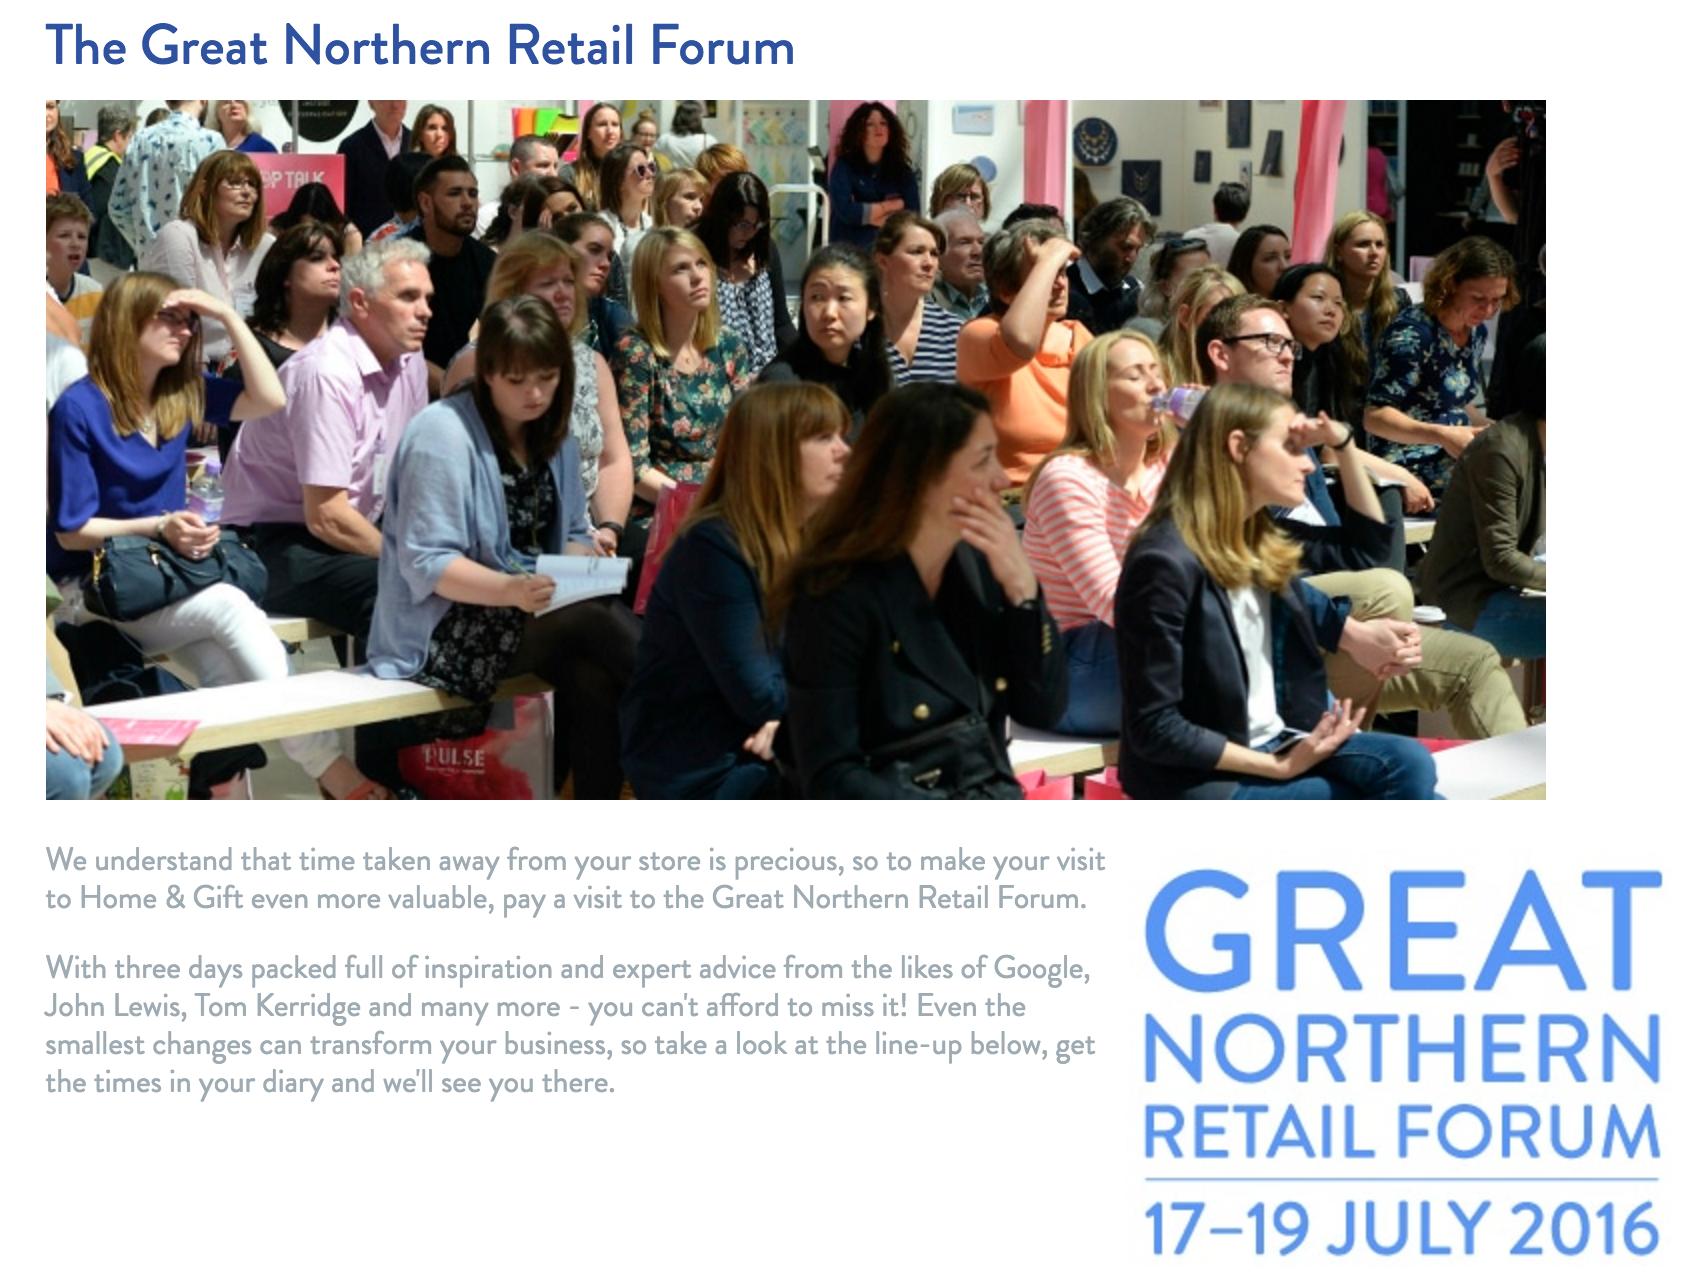 Great Northern Retail Forum